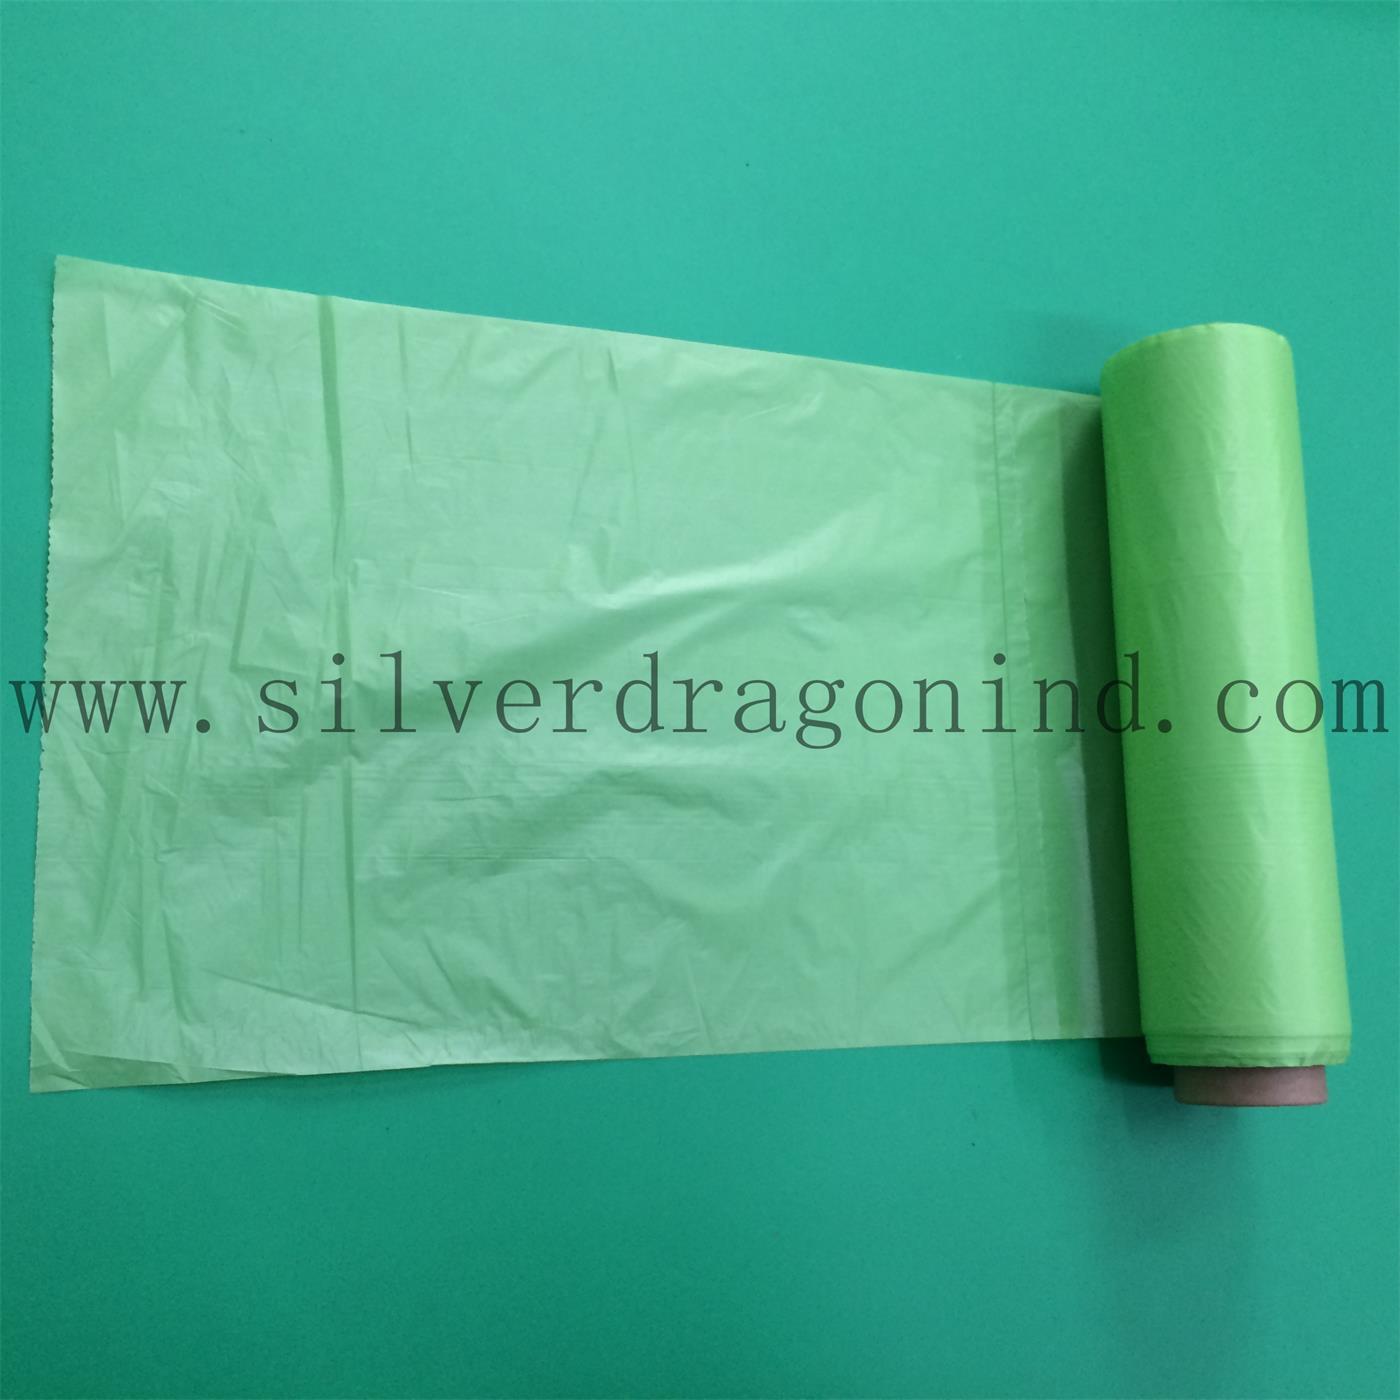 Eco-Friendly LDPE Plastic Trash Bags on Roll, Garbage Bag